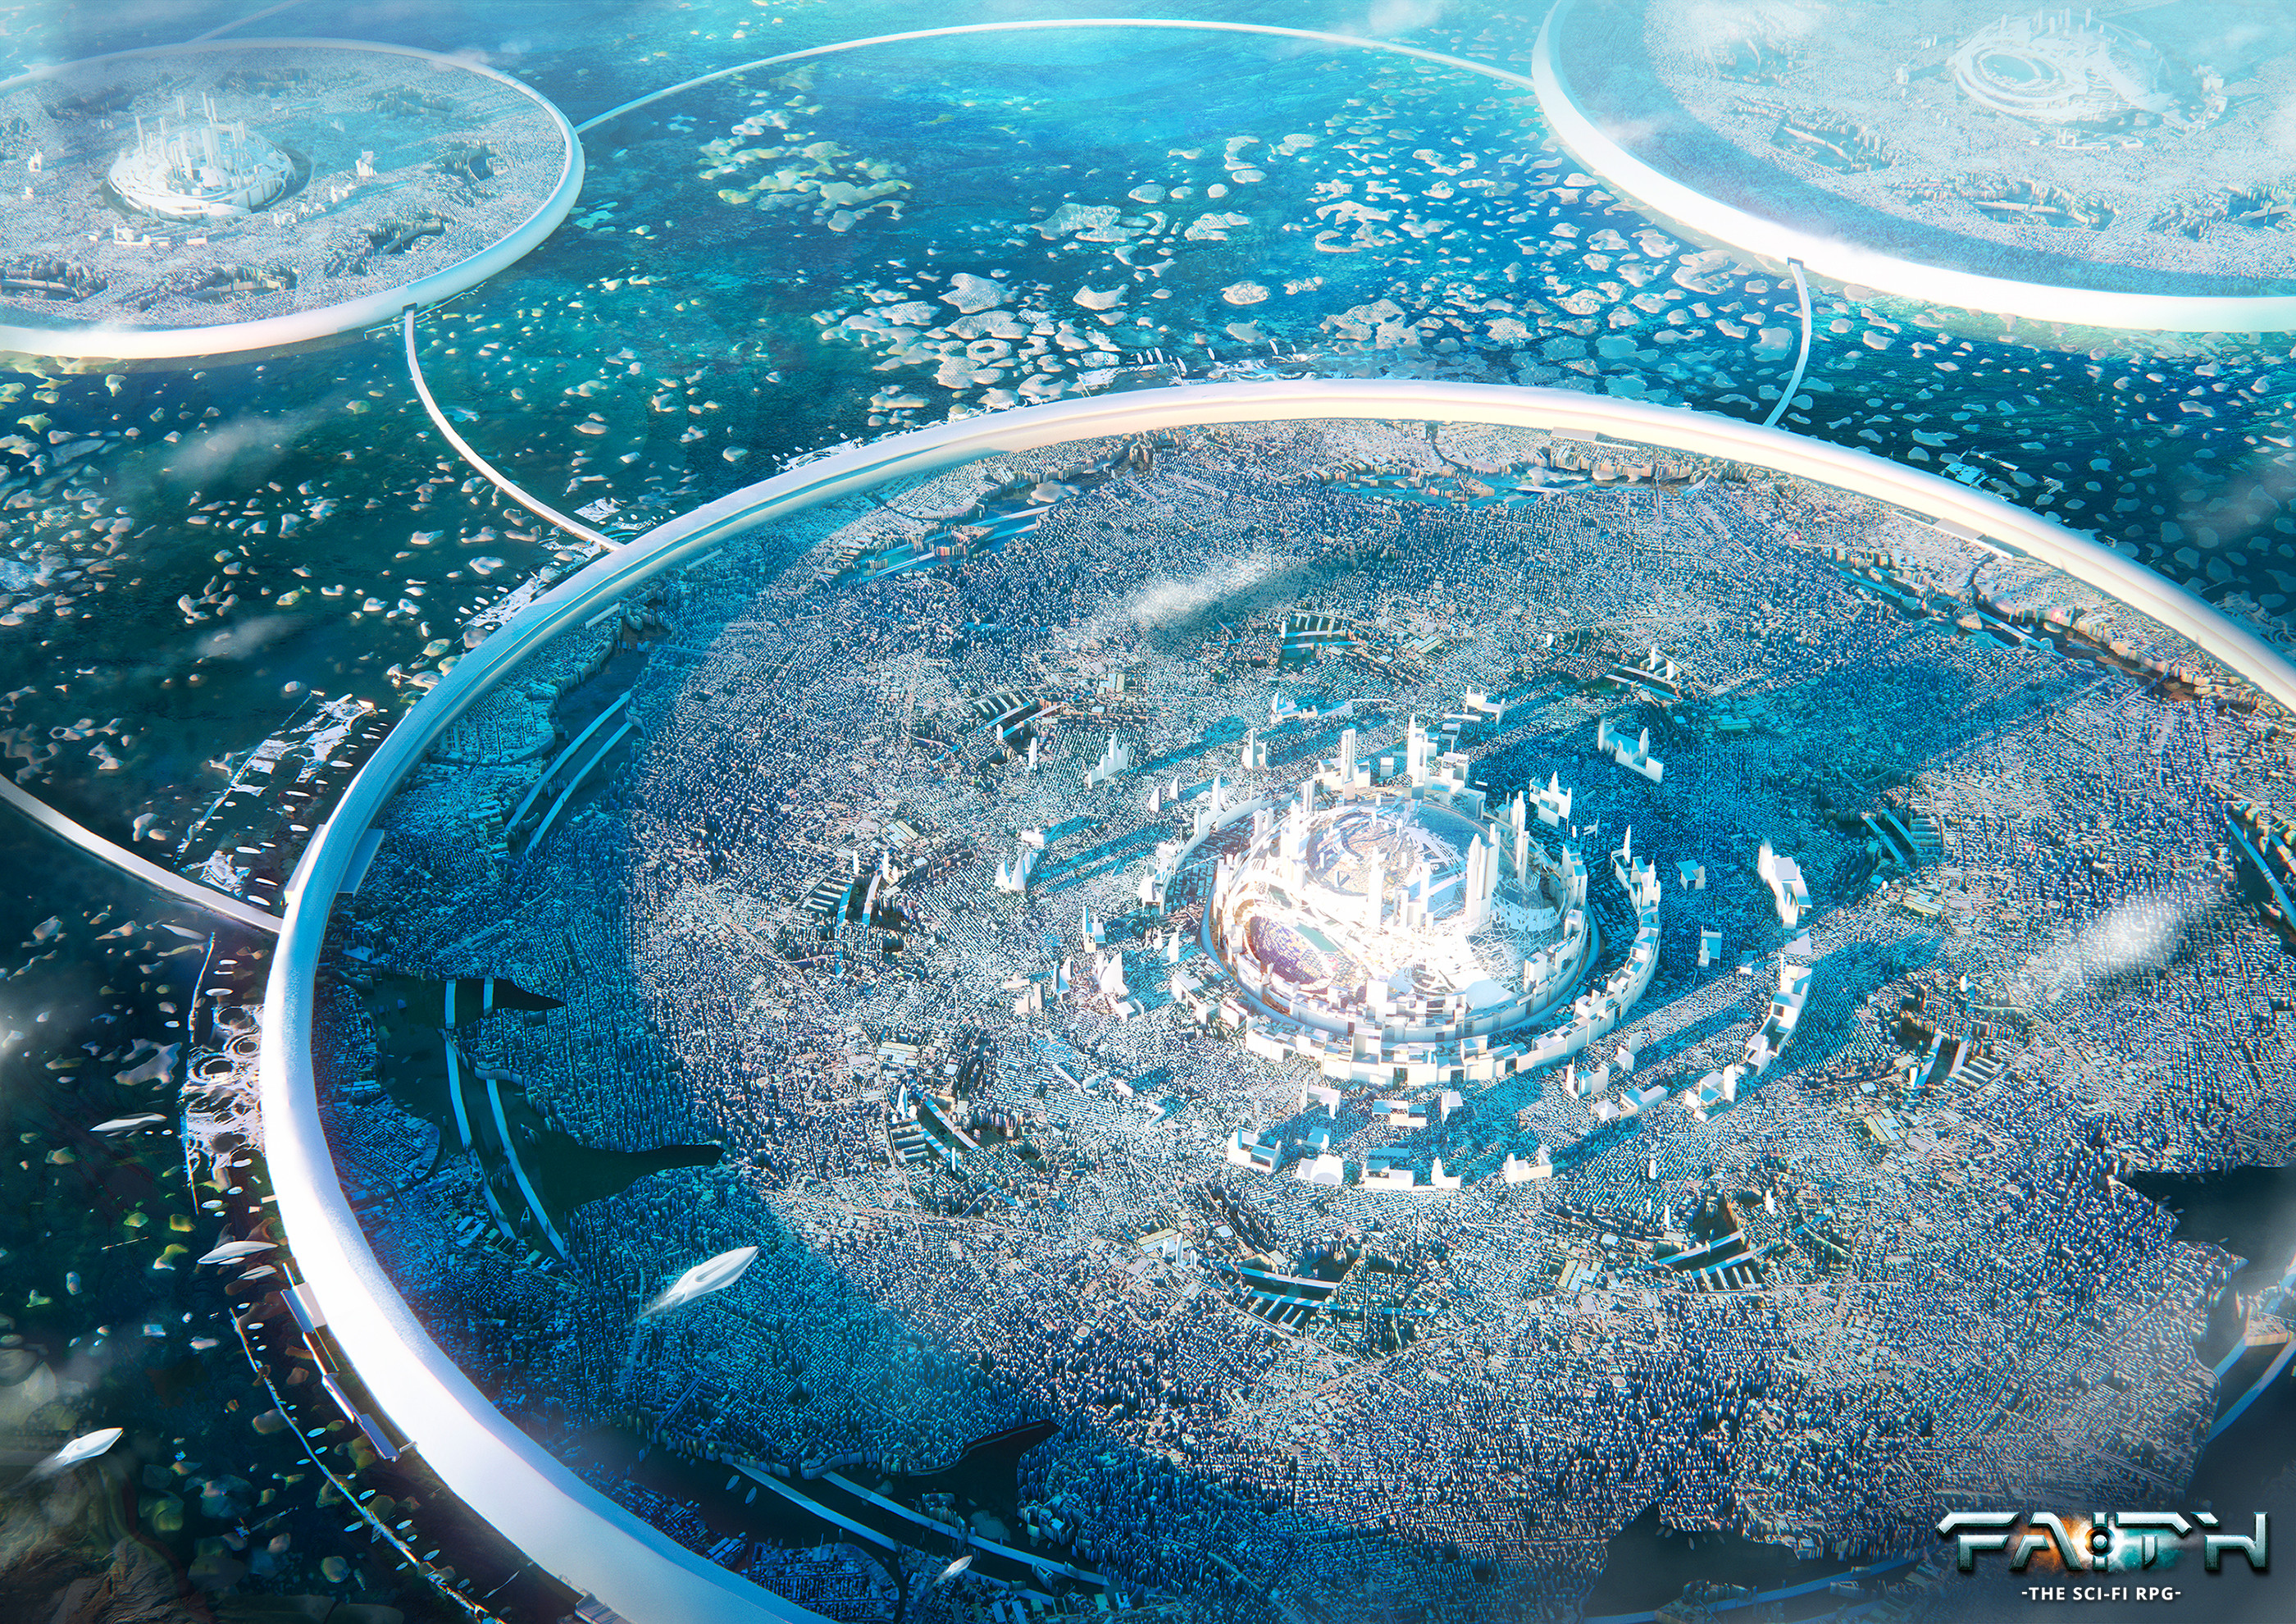 General 2800x1980 Leon Tukker ArtStation futuristic city digital art Faith: the Sci-Fi RPG RPG futuristic video game art